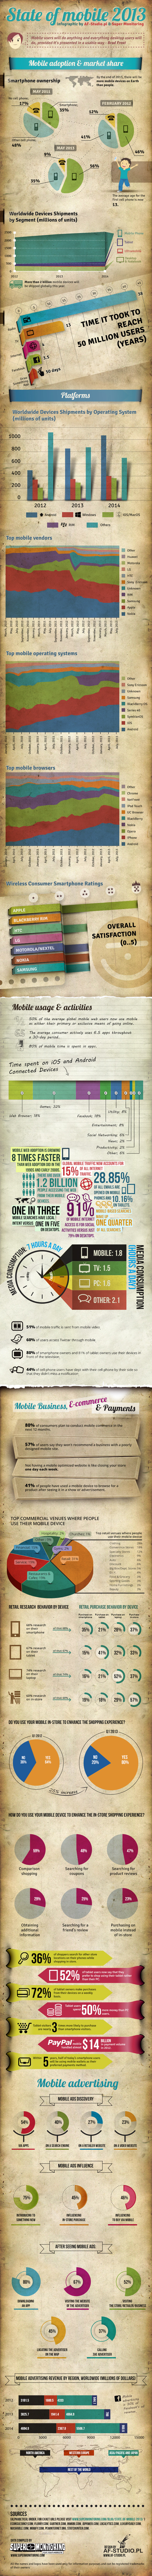 movil_infografia